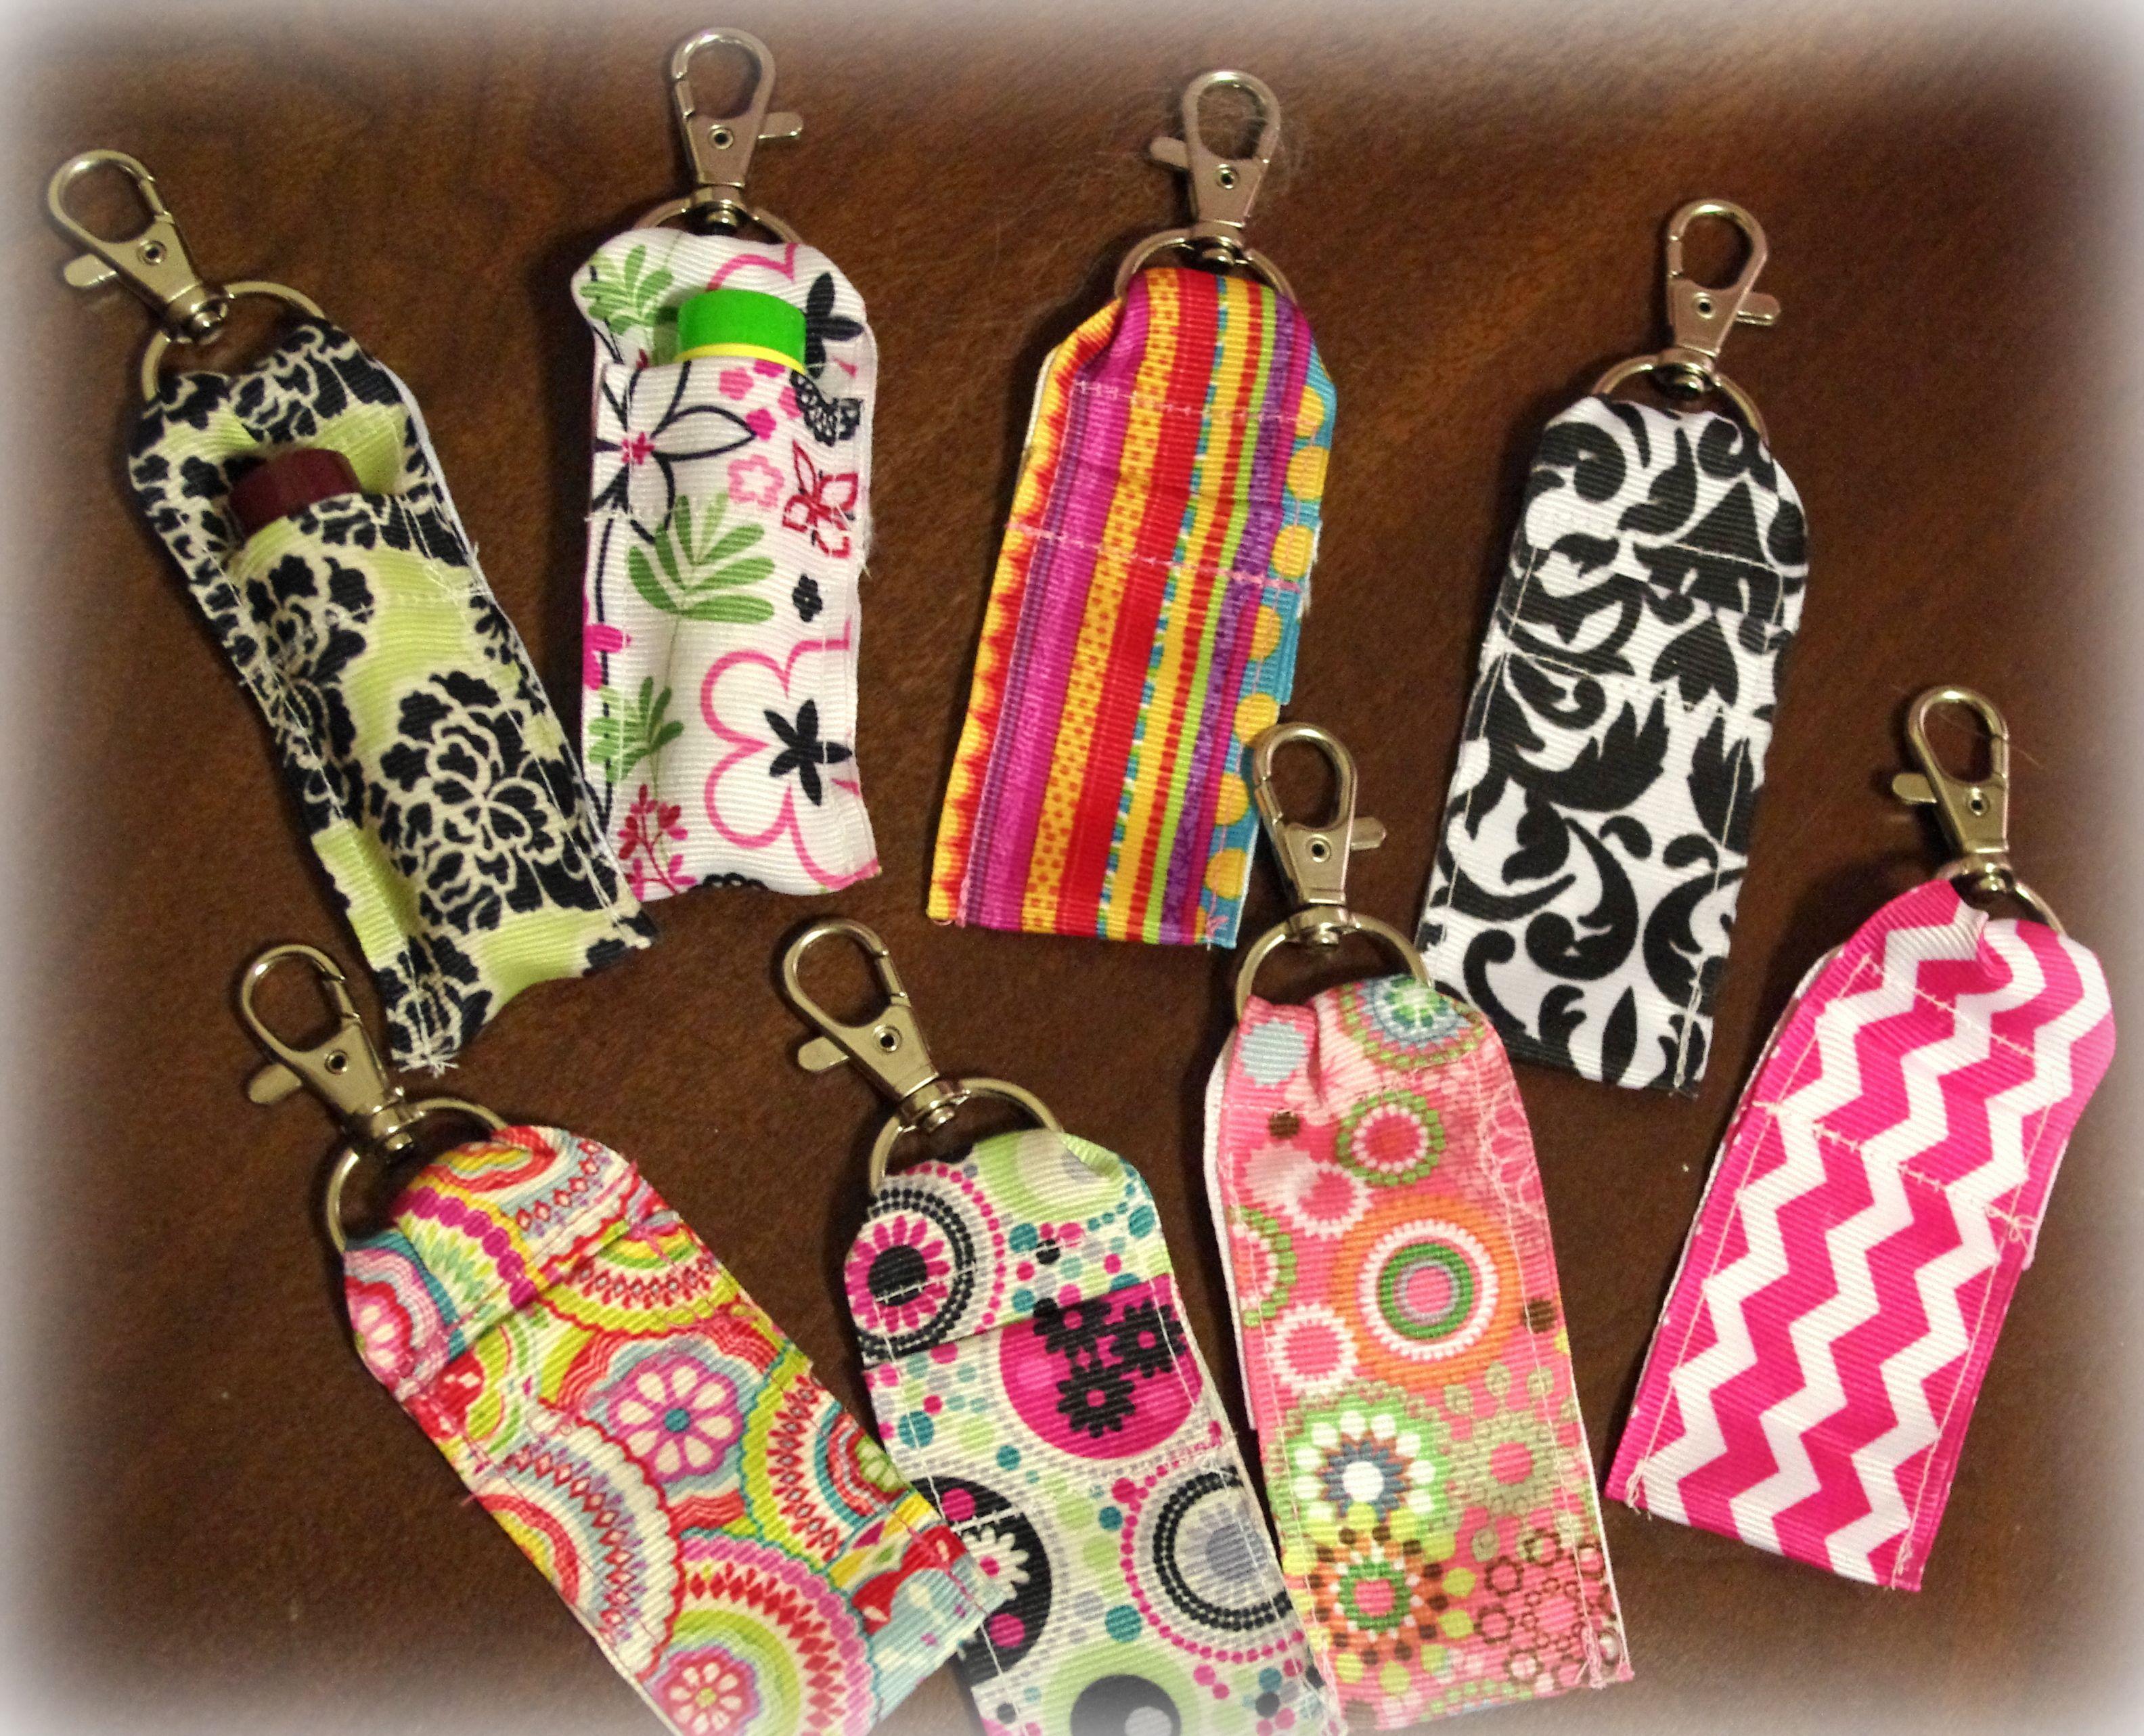 Diy Clip On Ribbon Lip Balm Holder Chapstick Holder Lip Balm Holder Sewing Projects For Beginners